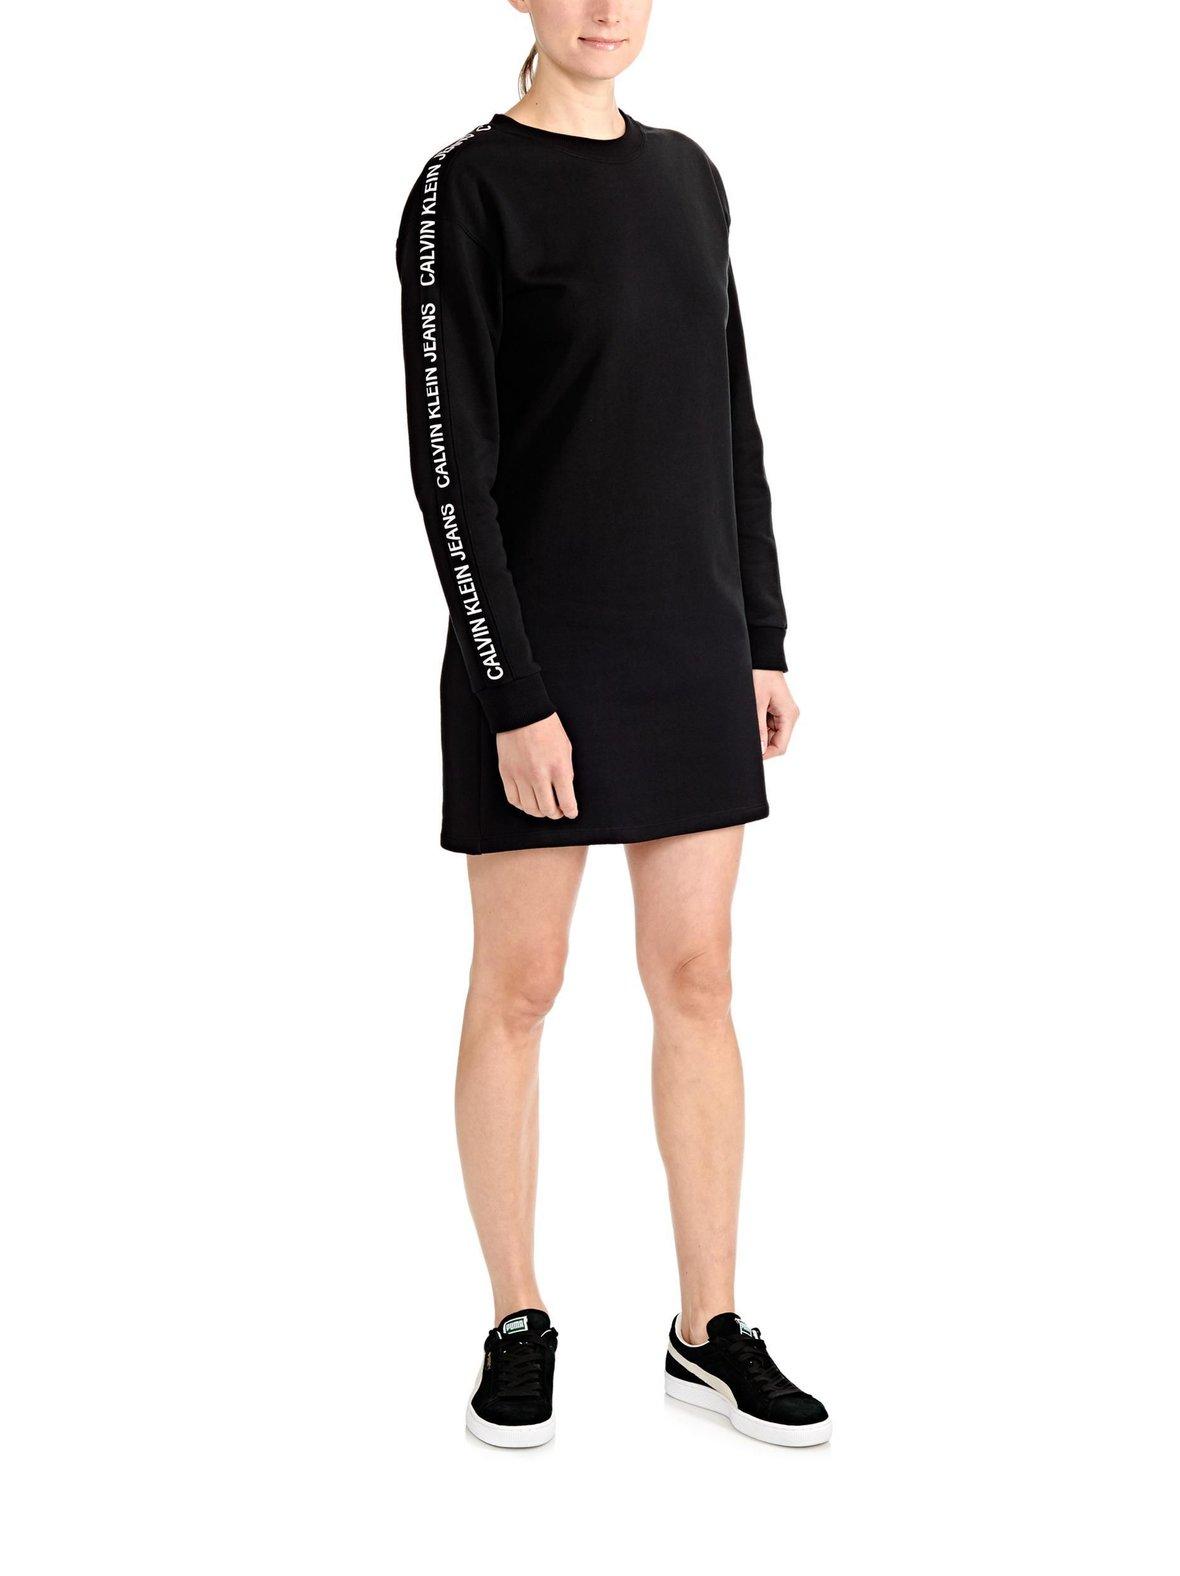 Black CollegemekkoXs Jeans Institutional Naiset Ck Logo Track c1JlKFT